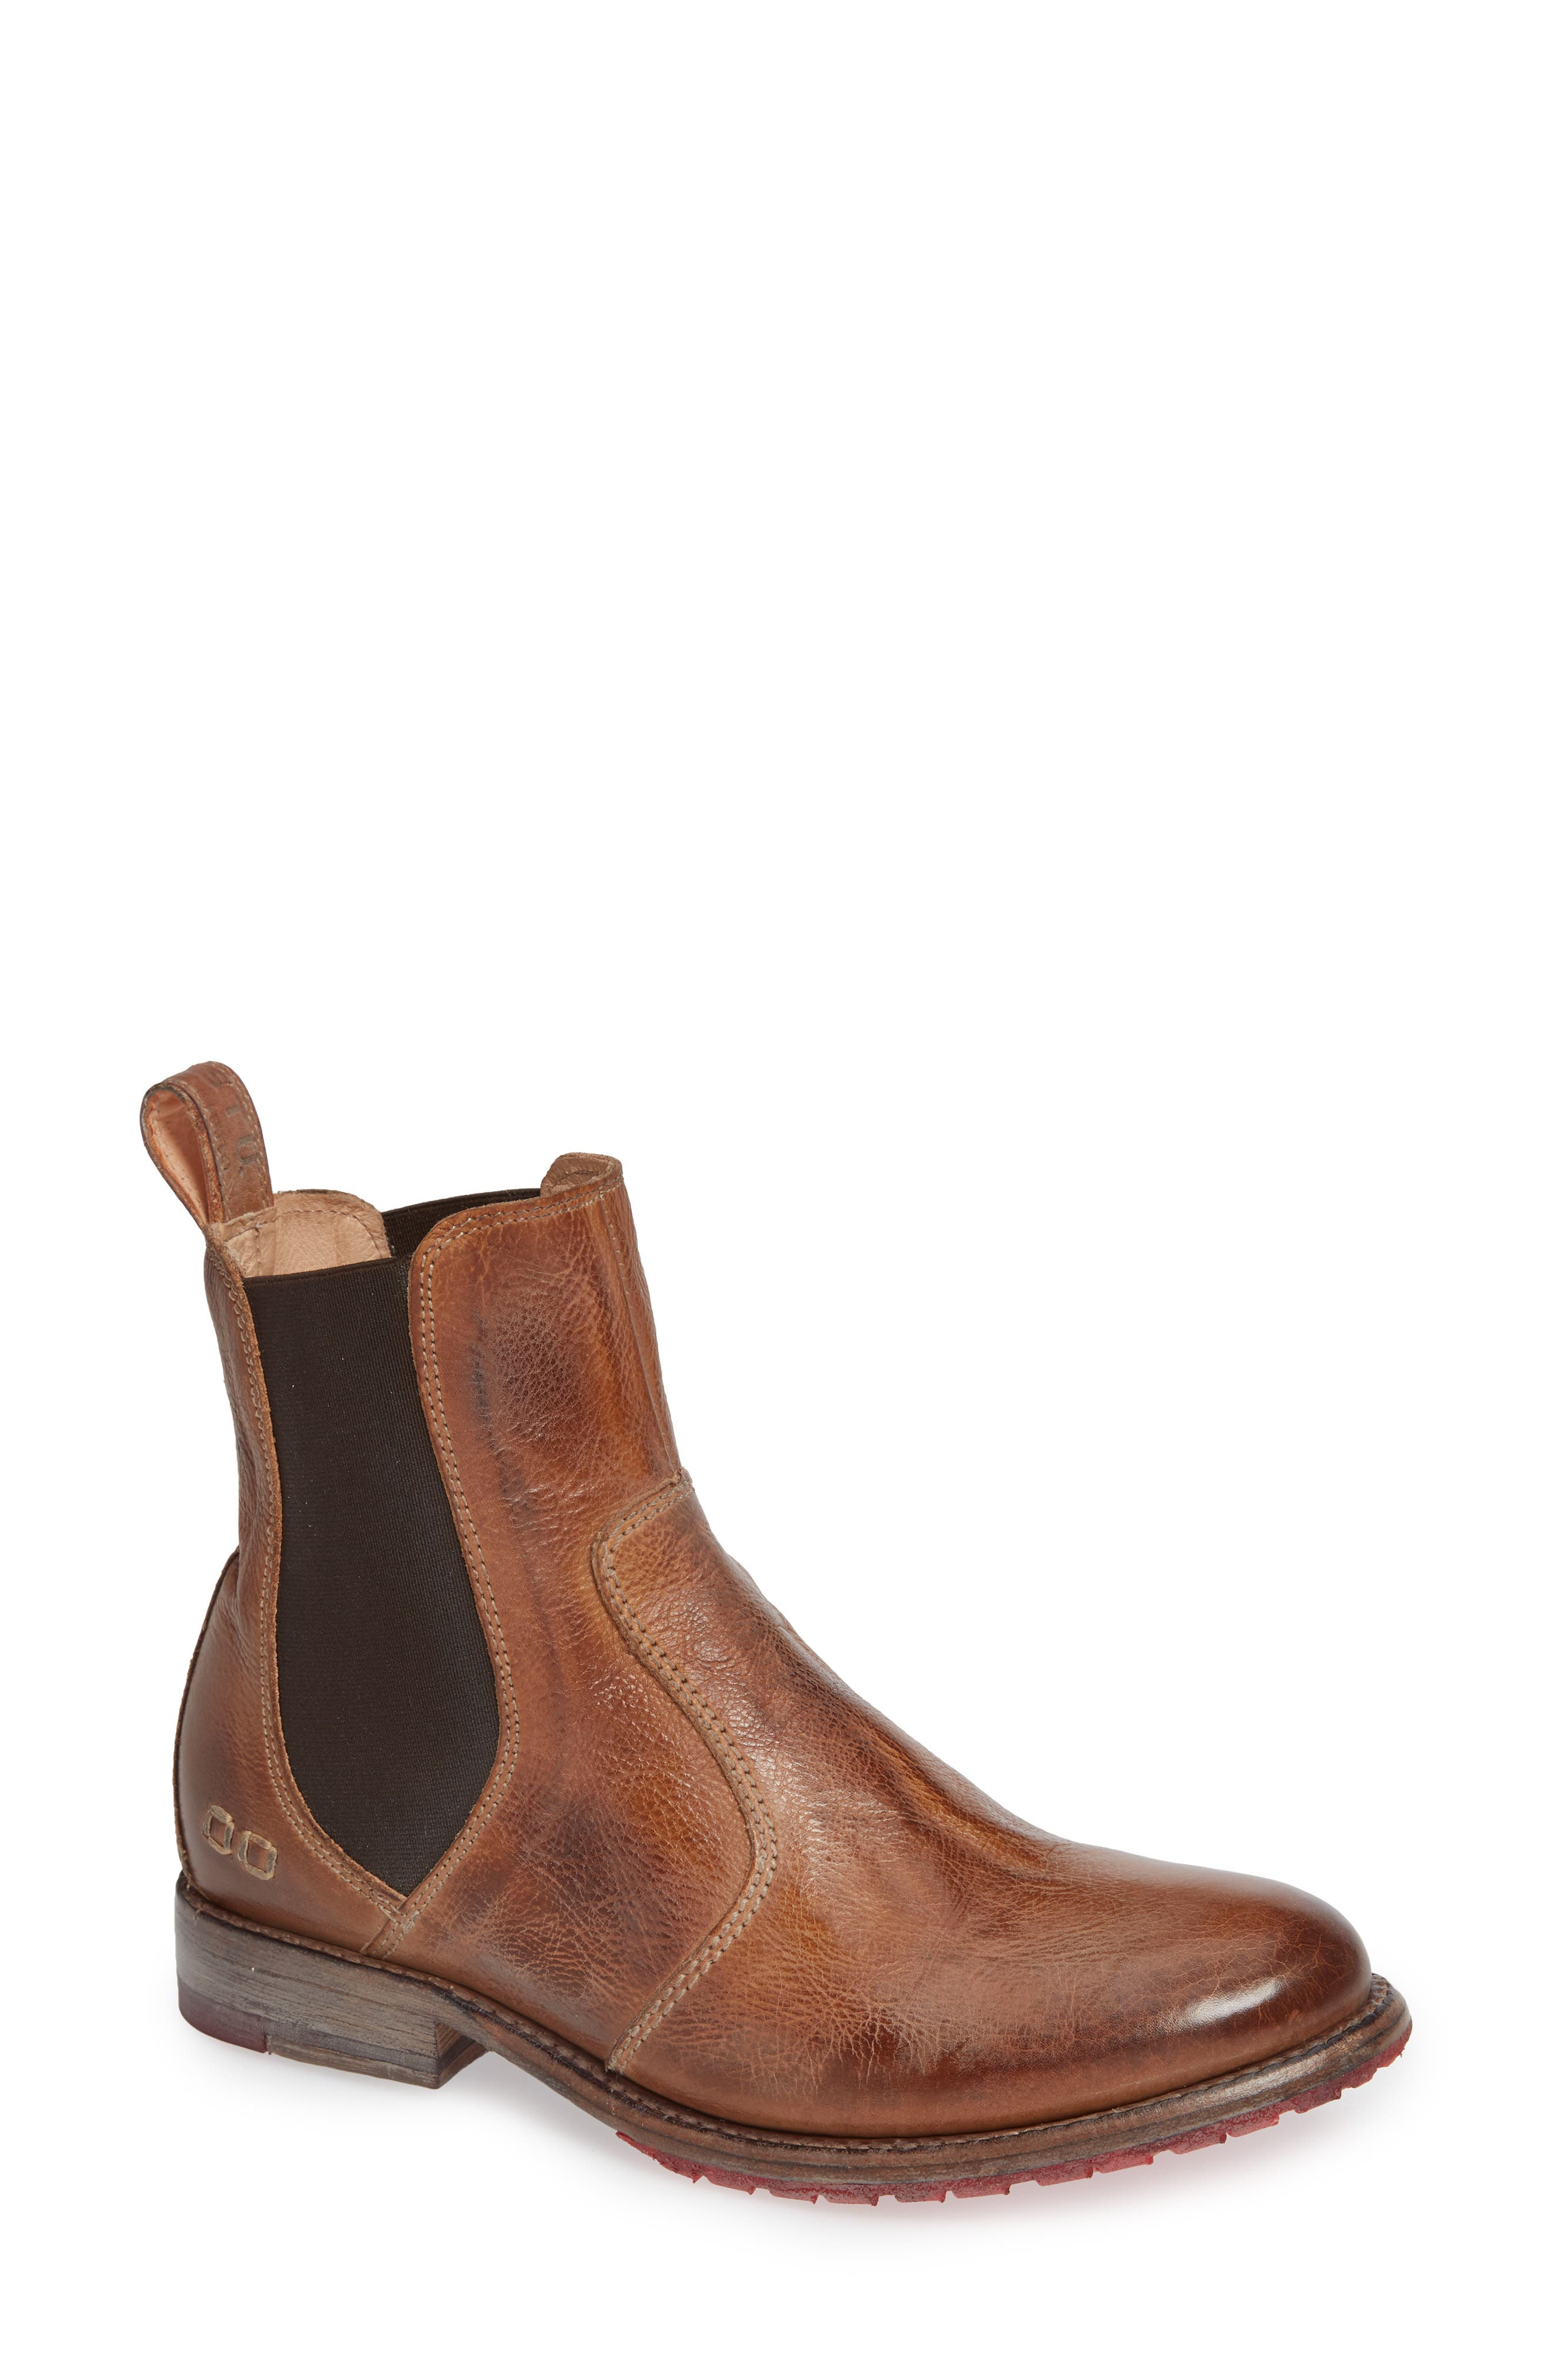 Bed Stu Nandi Chelsea Boot- Brown